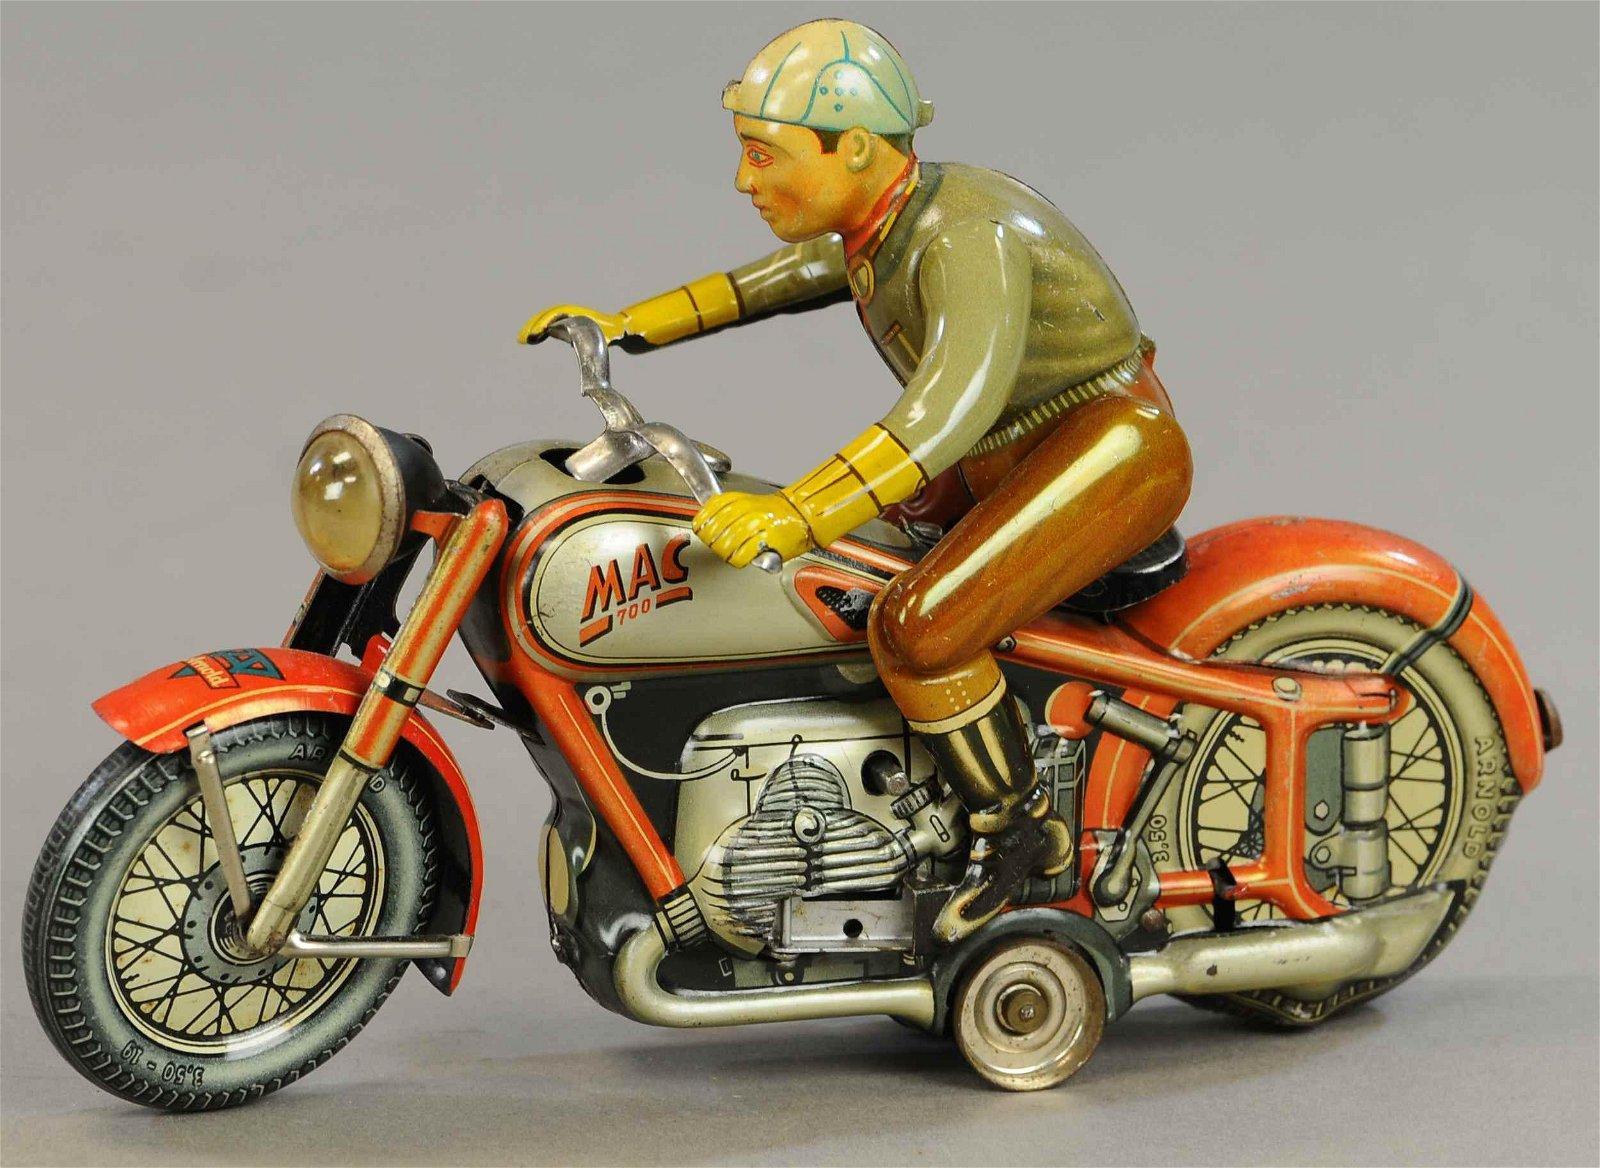 ARNOLD MAC 700 MOTORCYCLE